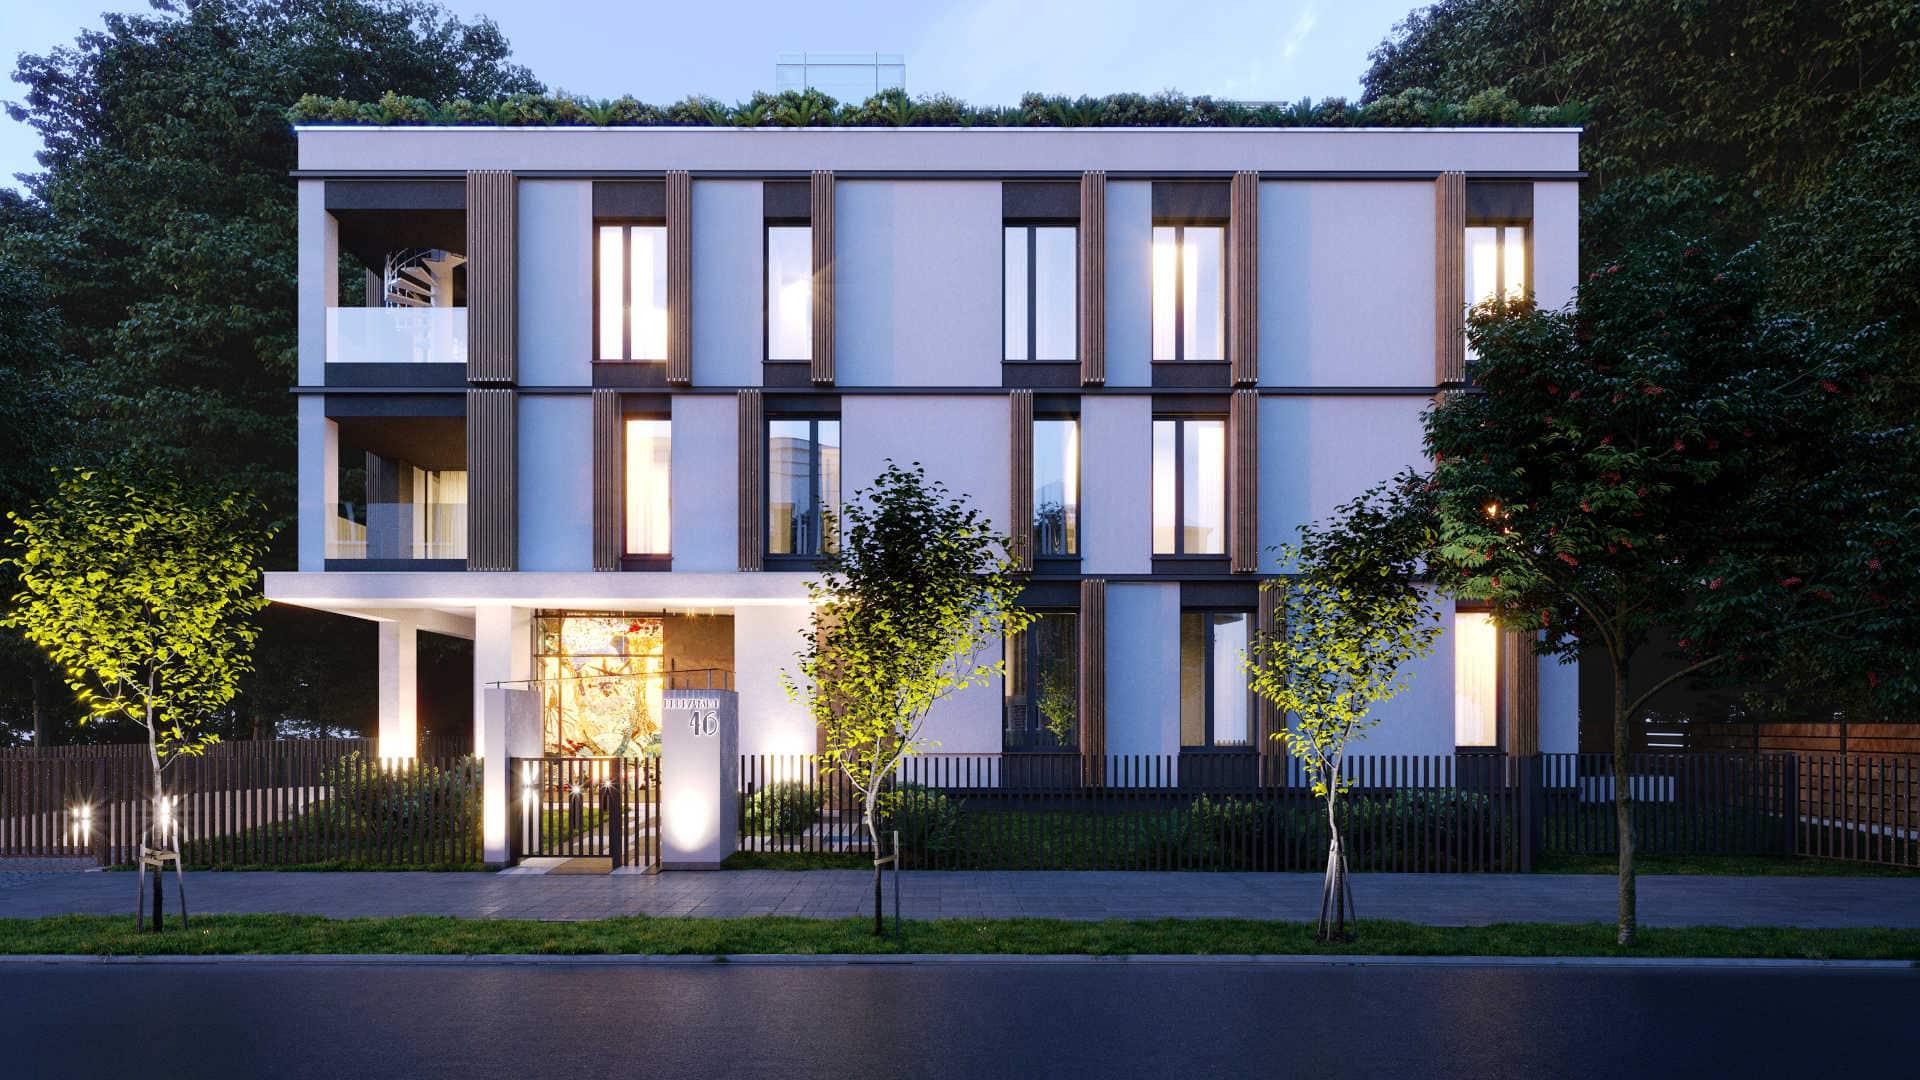 nowe-apartamenty-warszawa-saska-kepa-berezynska46-5